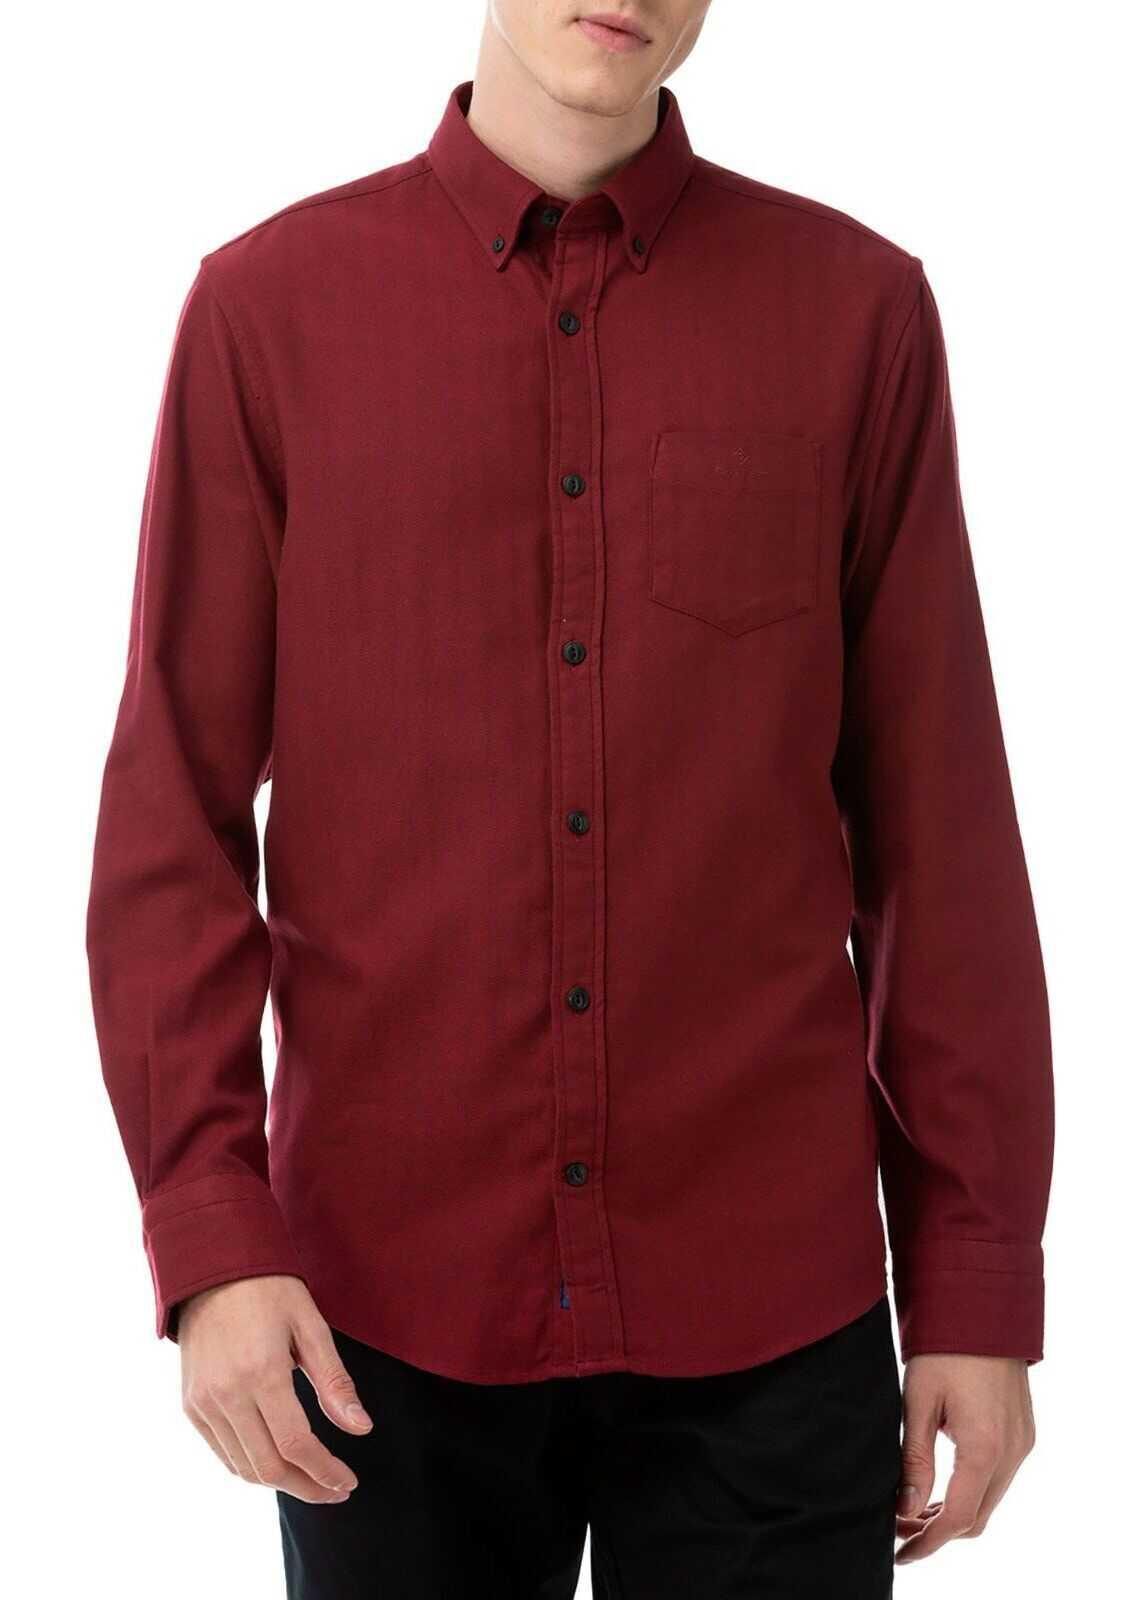 GANT Cotton Shirt BURGUNDY